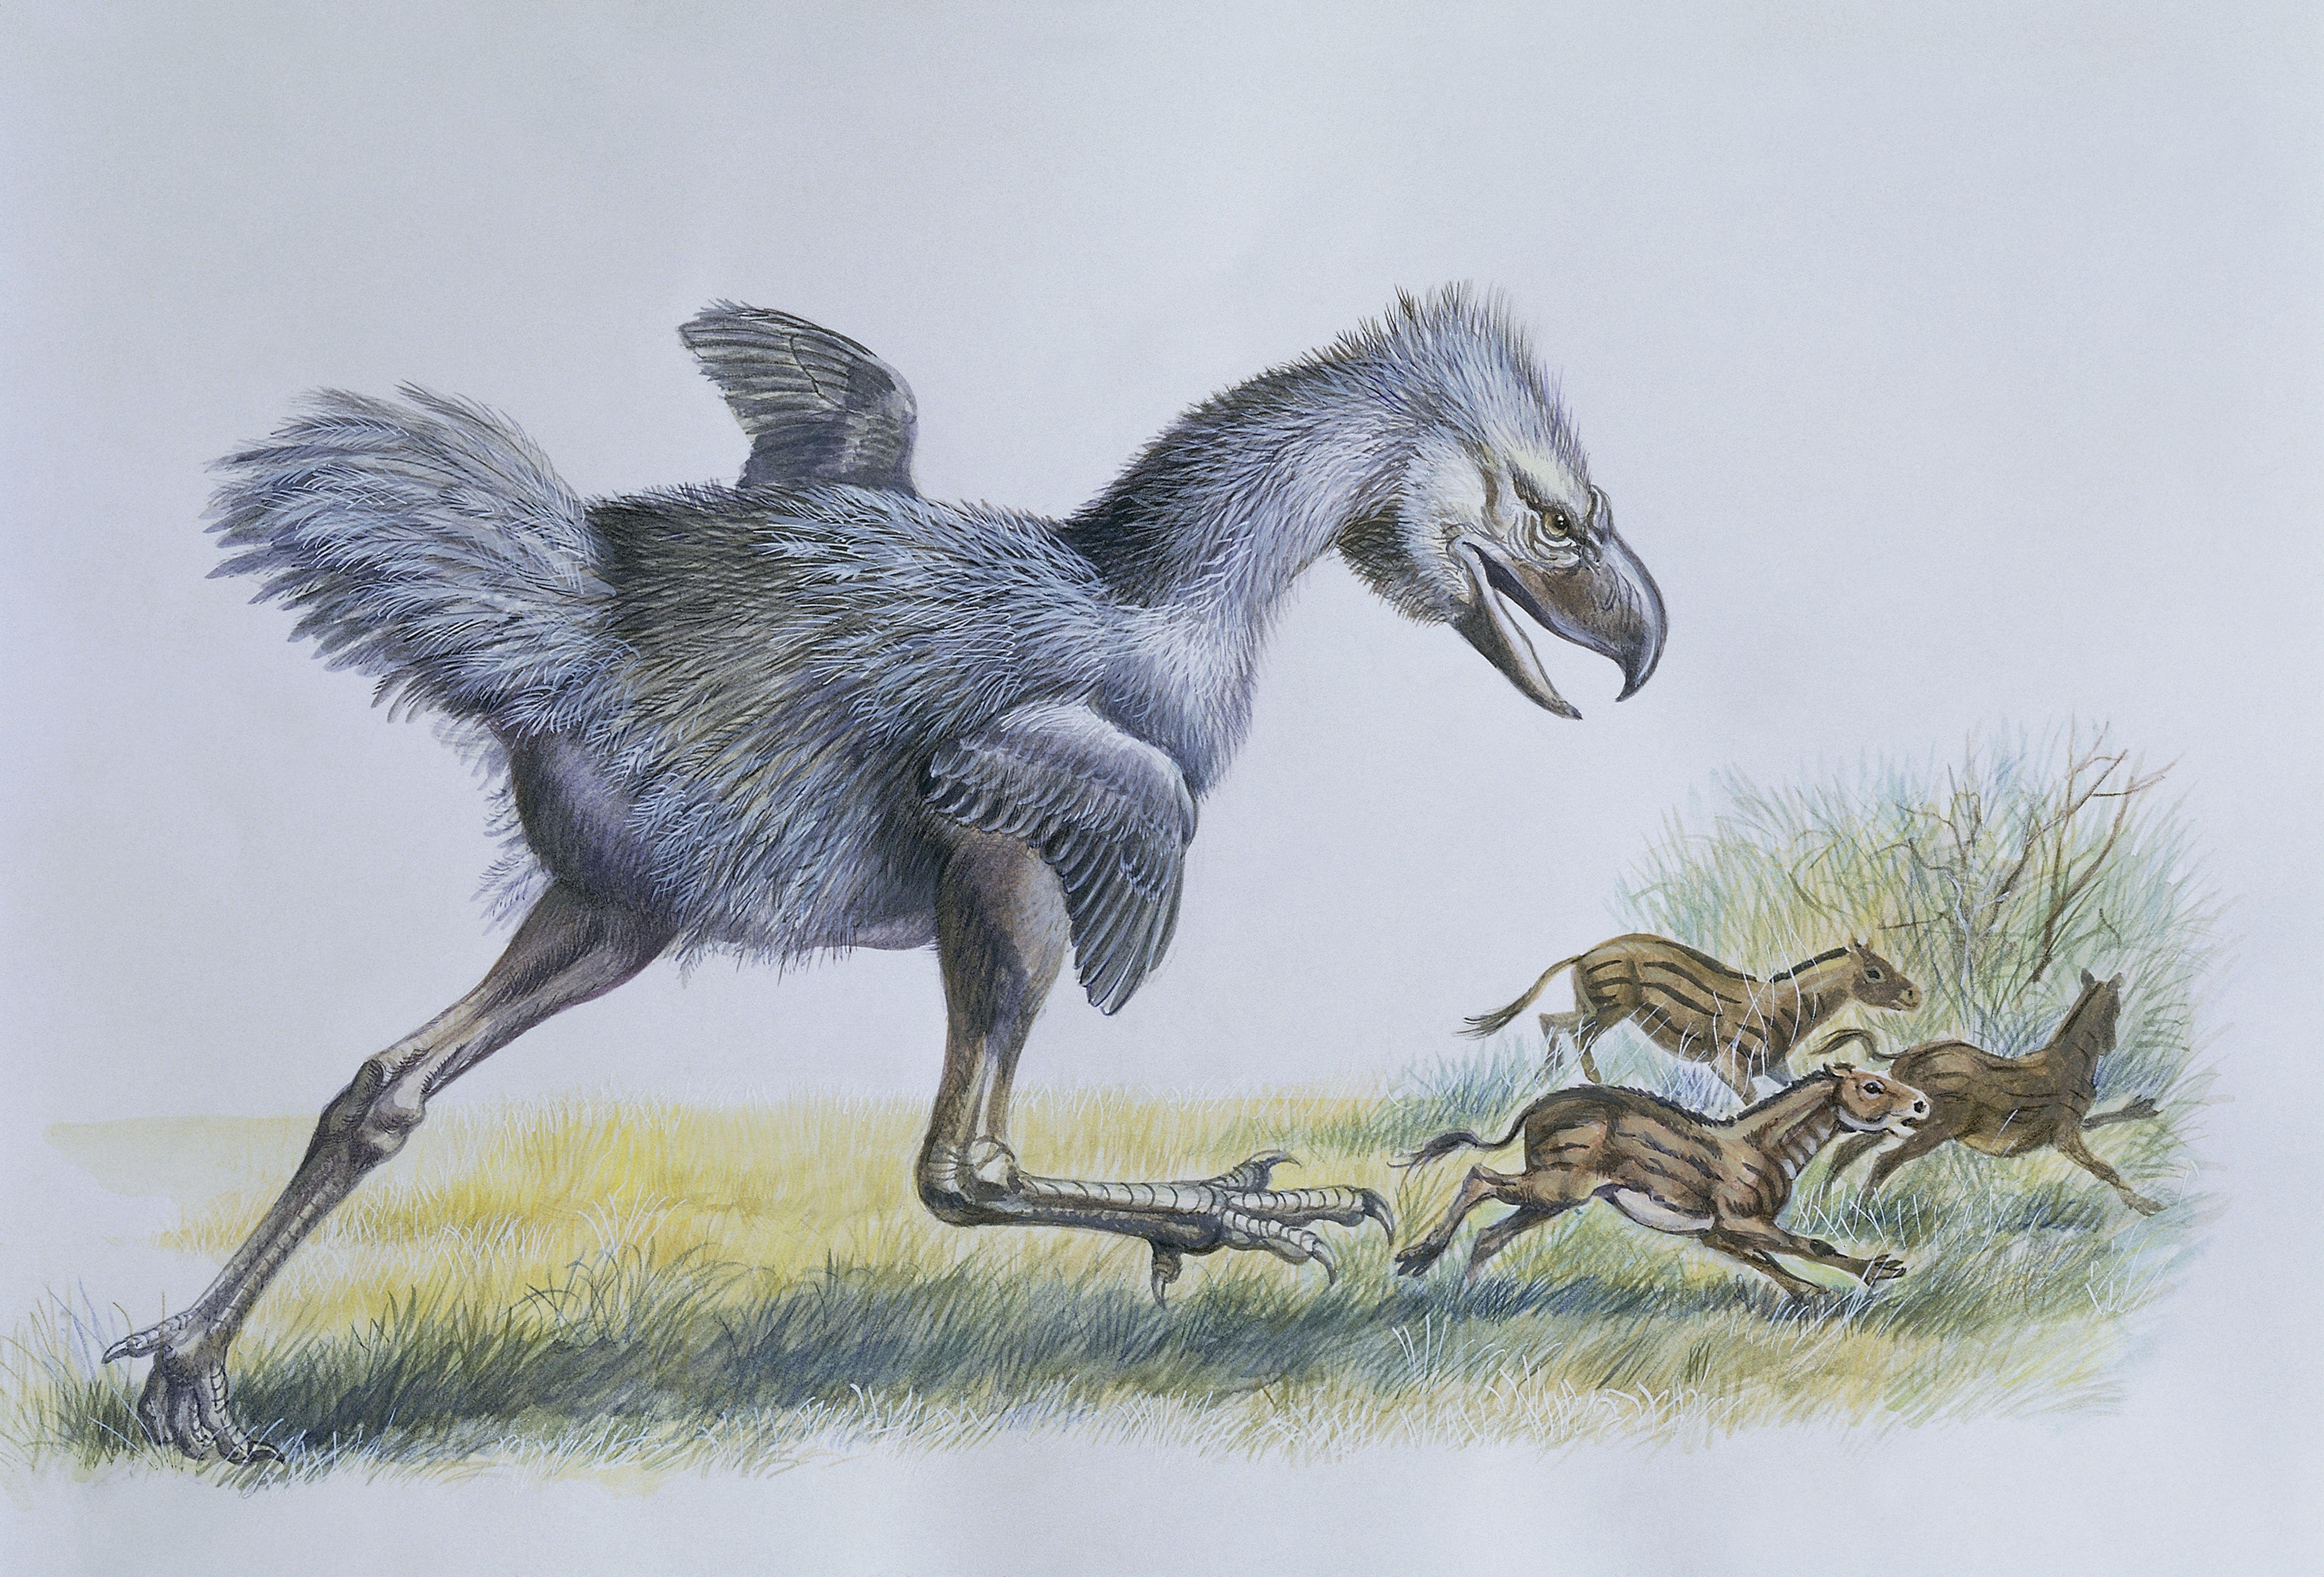 Close-up of a phorusrhacos (Phorusrhacos longissimus) chasing Eohippuses